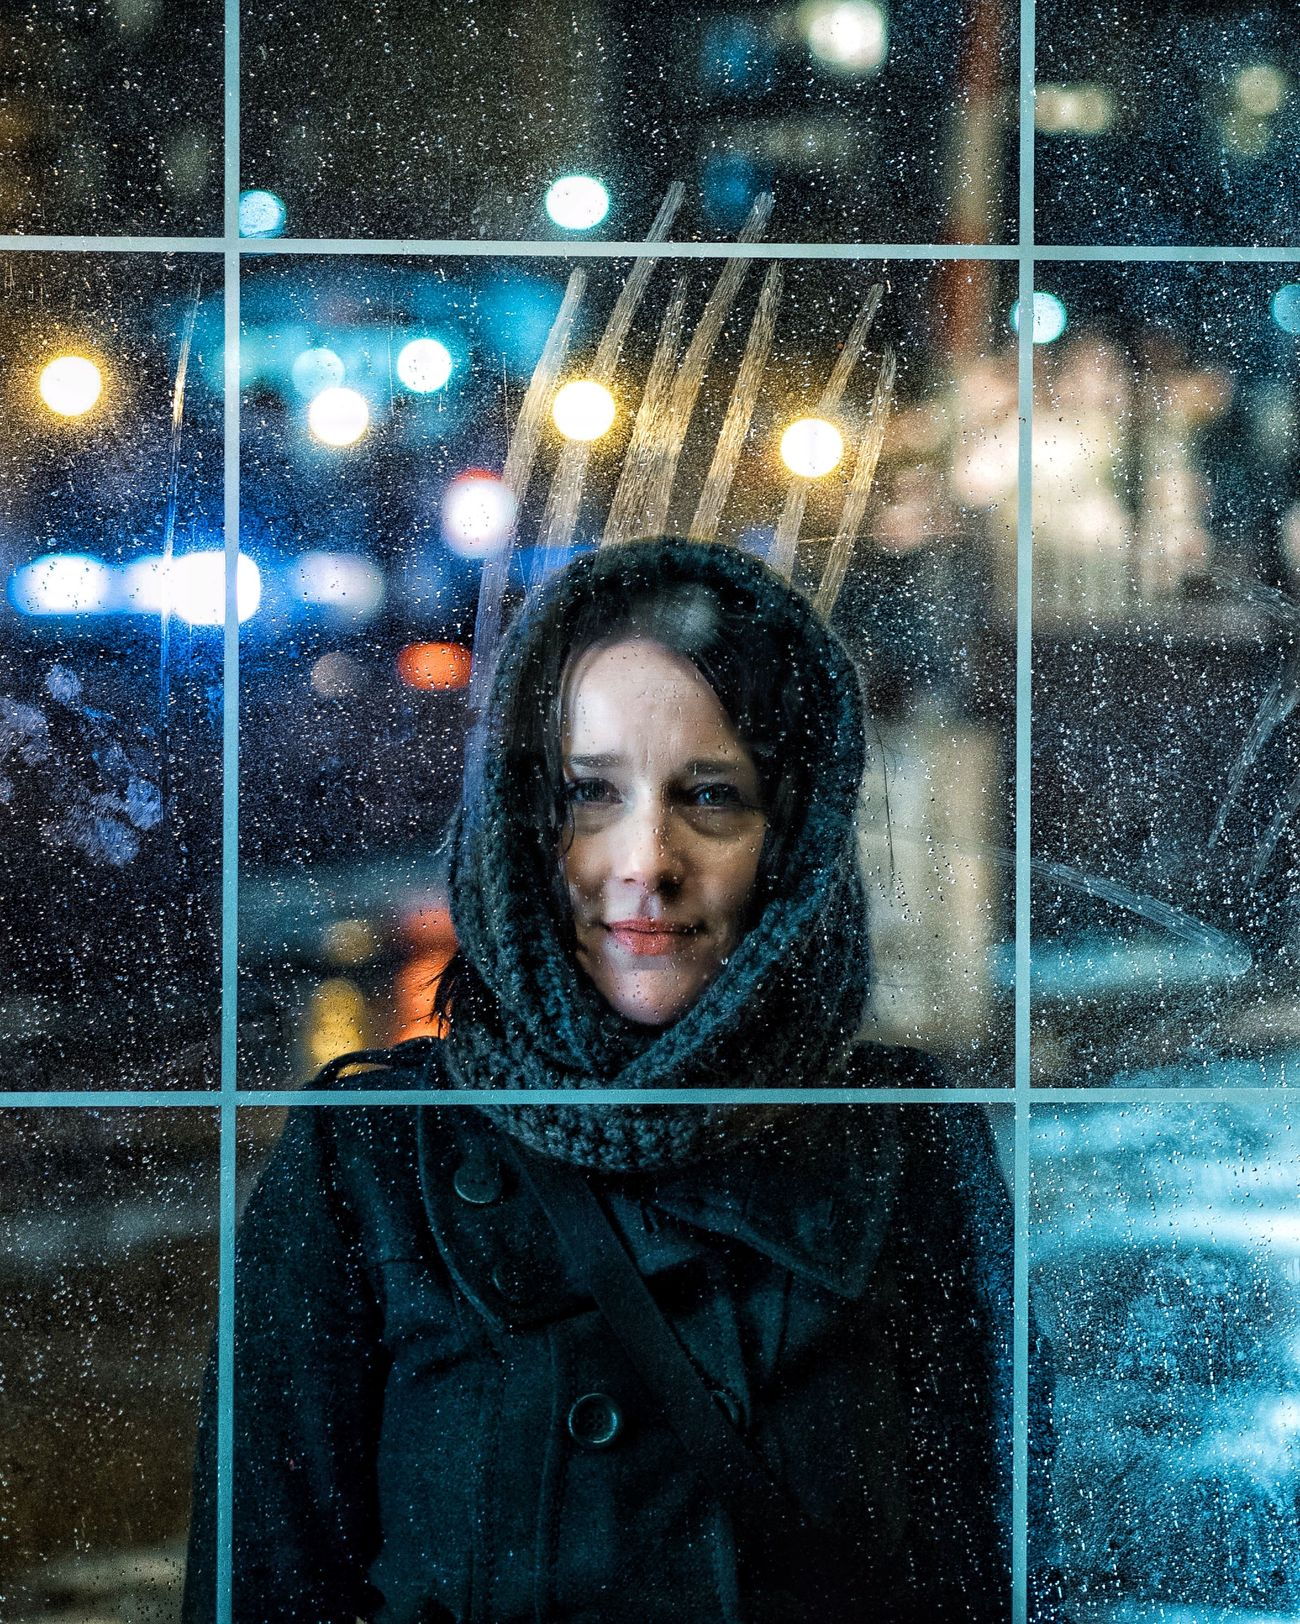 Portrait Winter Cold Temperature Light Colors EyeEm Best Shots Light Dark Bokeh Photography Fashion Abstract Rain Raindrops Women Who Inspire You Portrait Of A Woman The Week On EyeEm